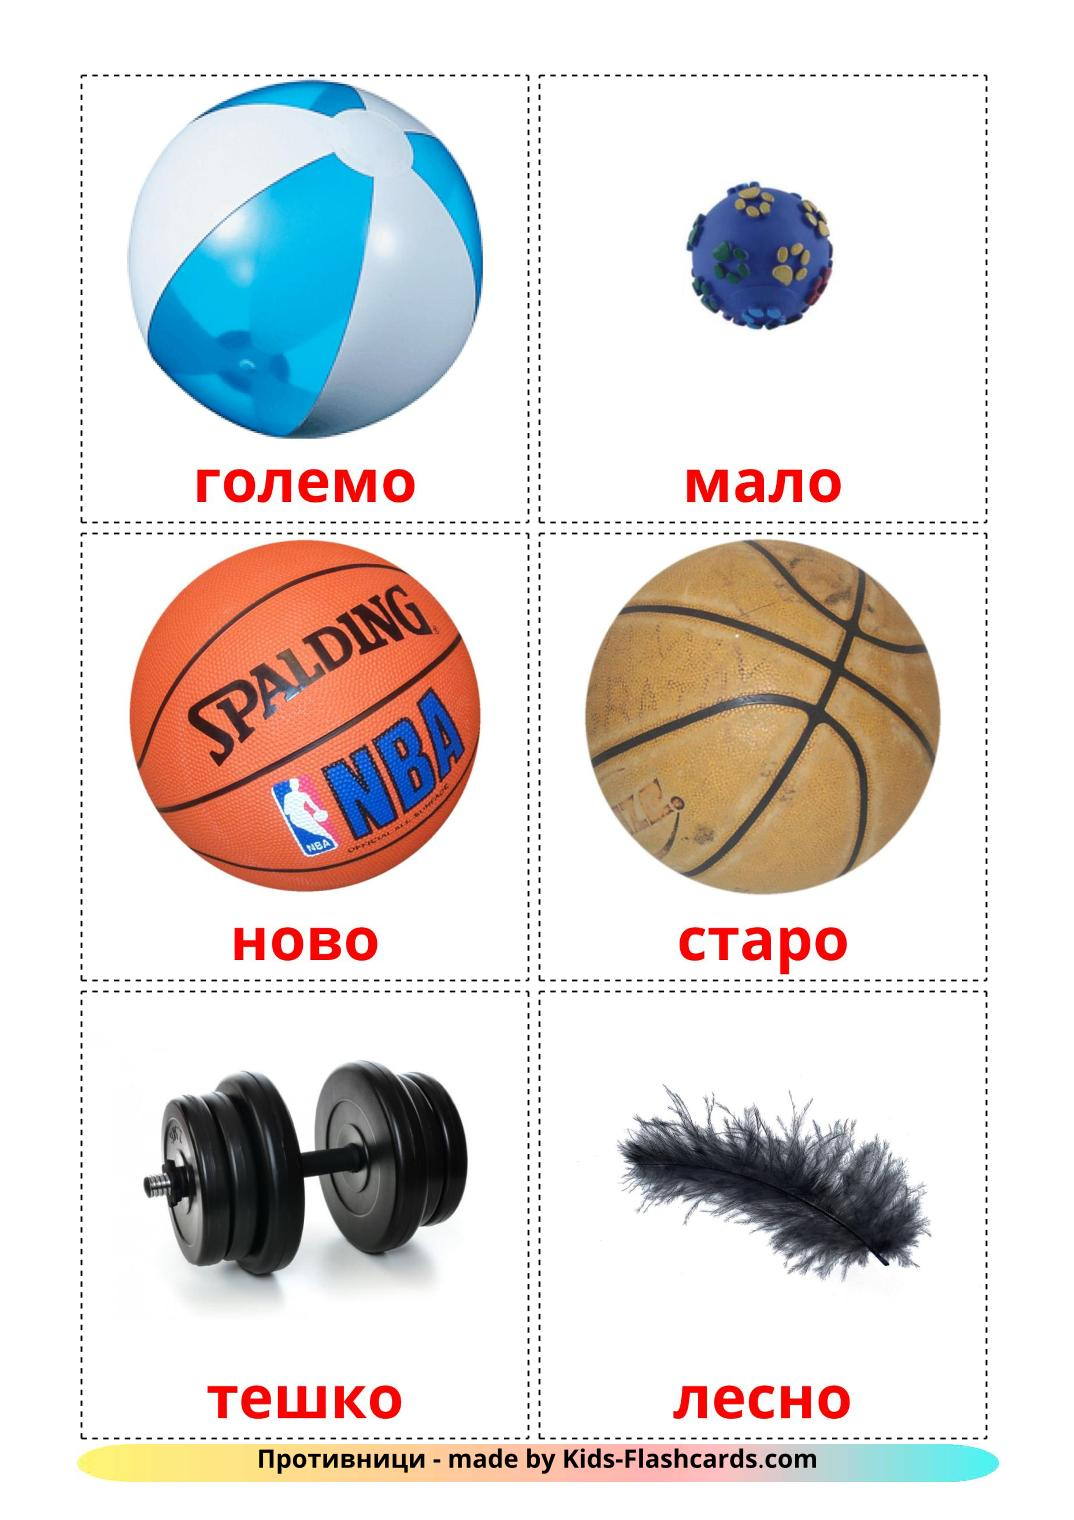 Opposites - 74 Free Printable macedonian Flashcards